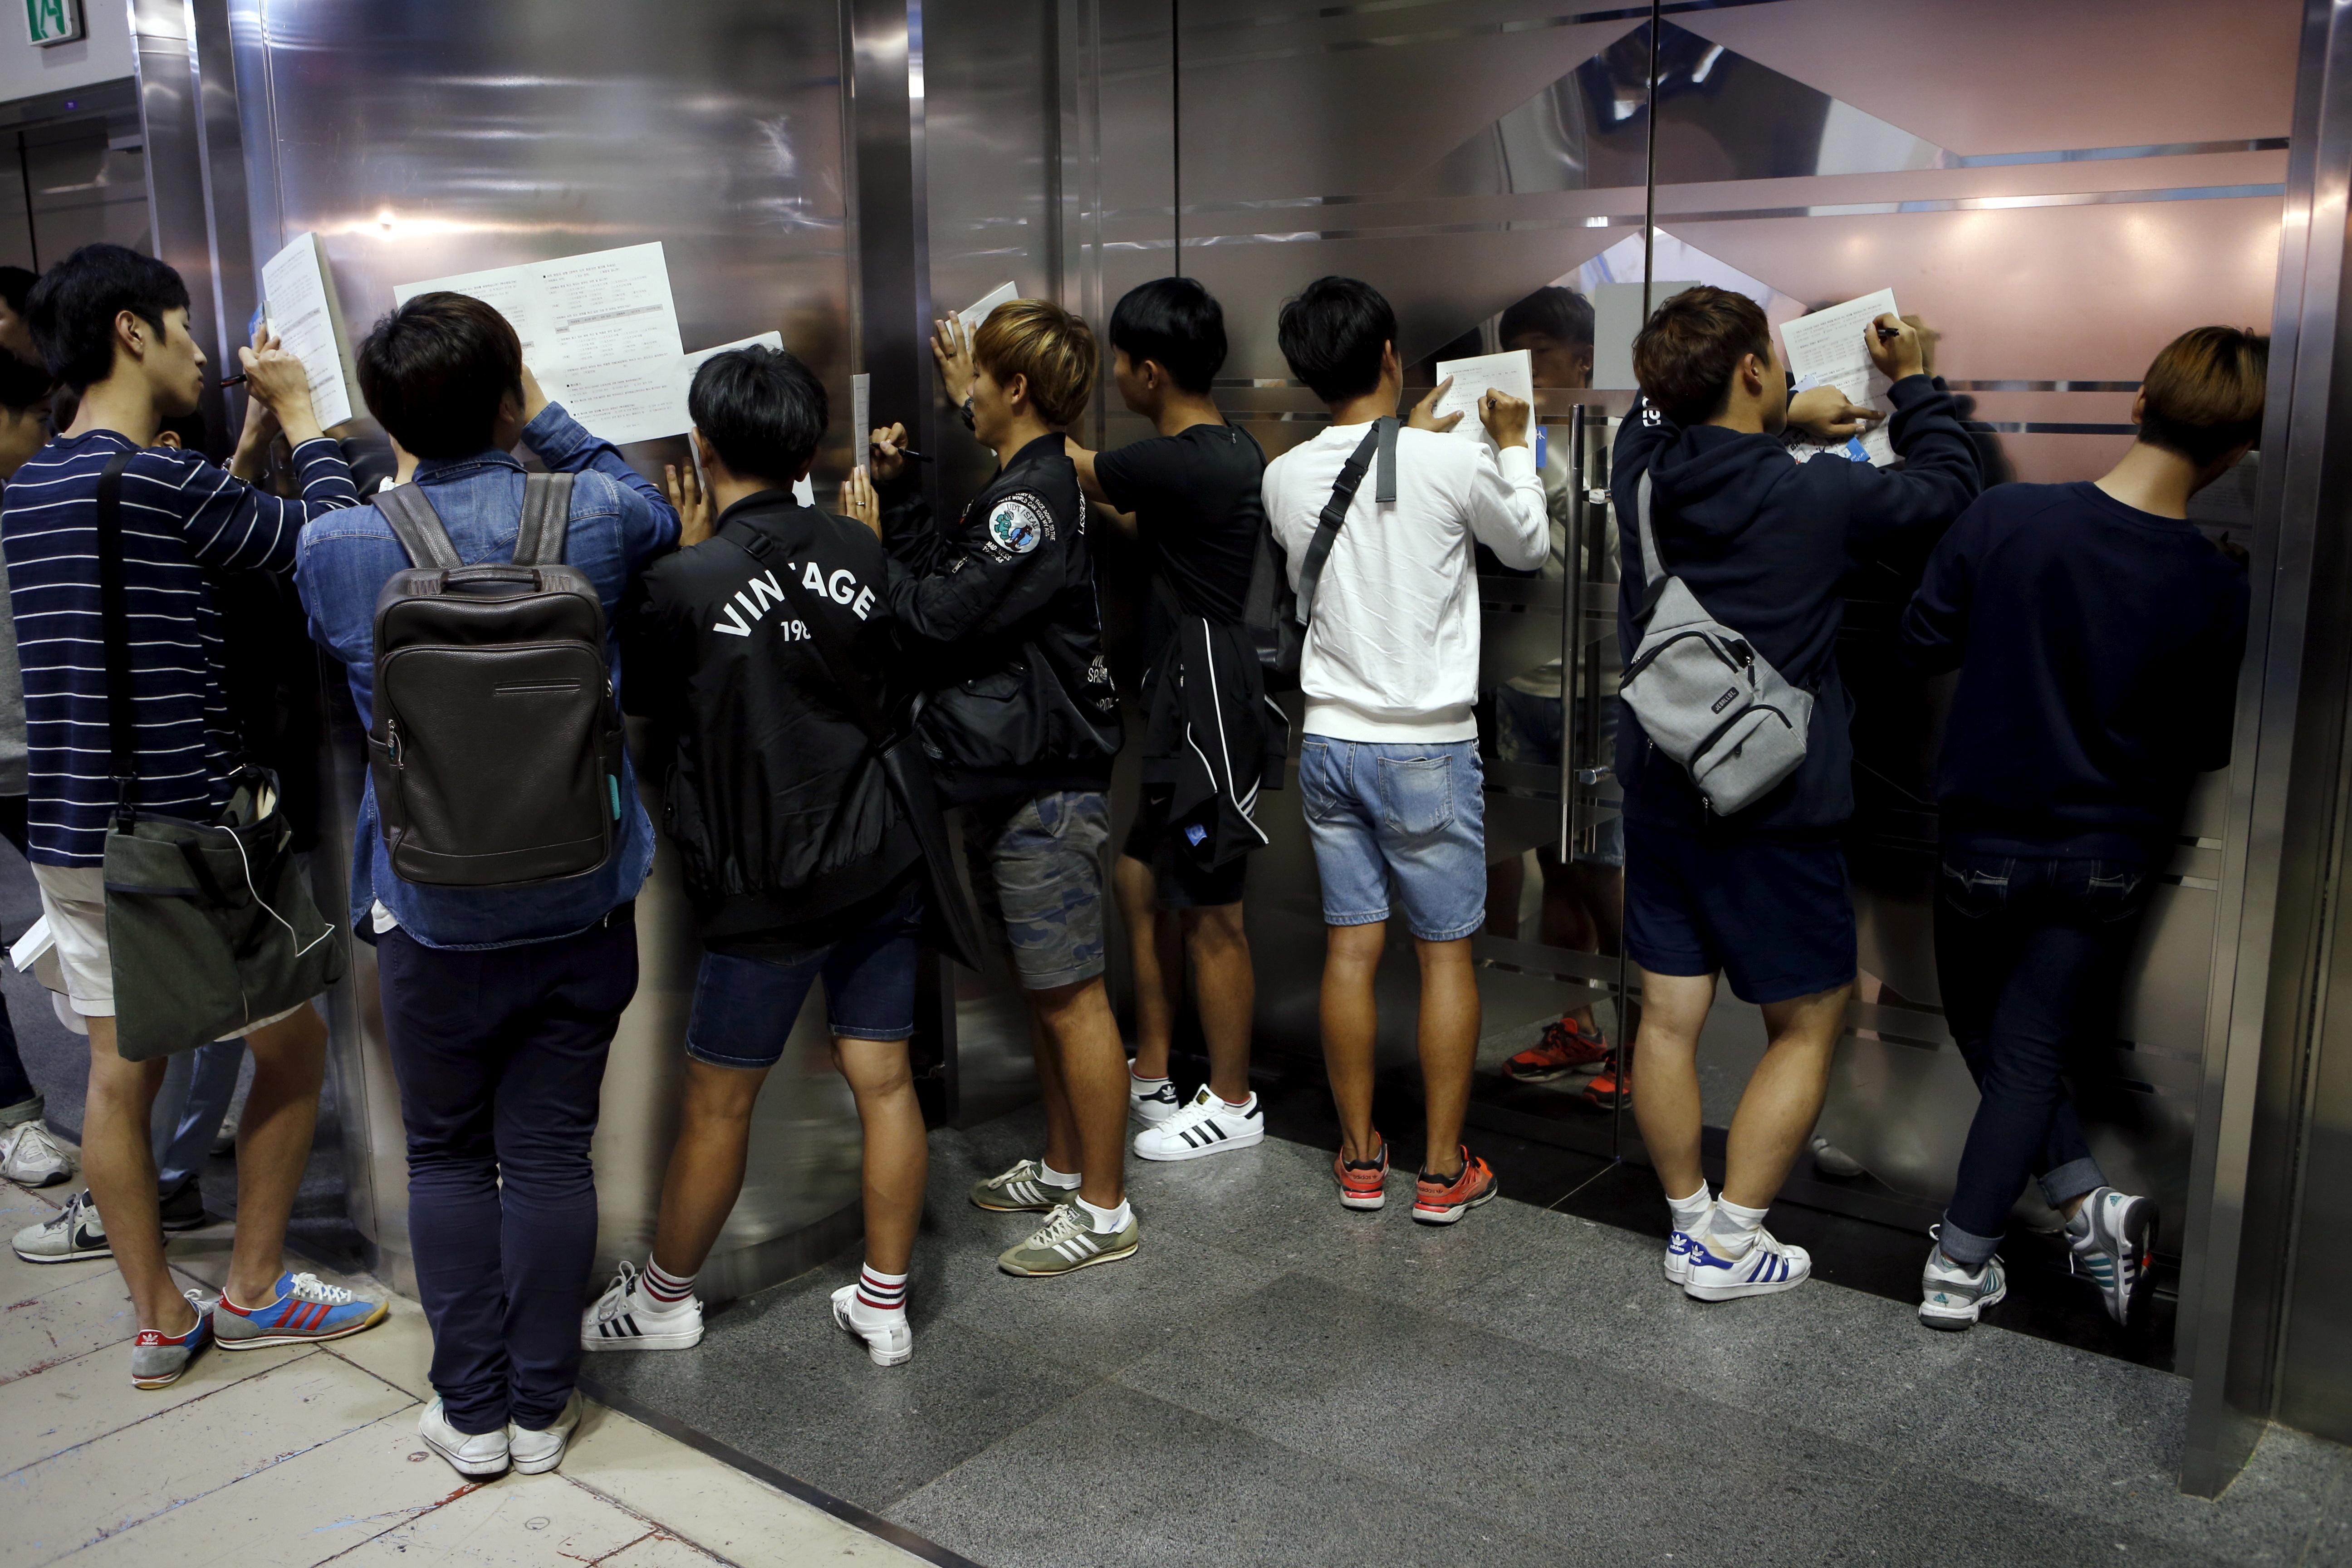 University students write on documents at an employment fair in Seoul, South Korea, September 23, 2015. REUTERS/Kim Hong-Ji/File Photo